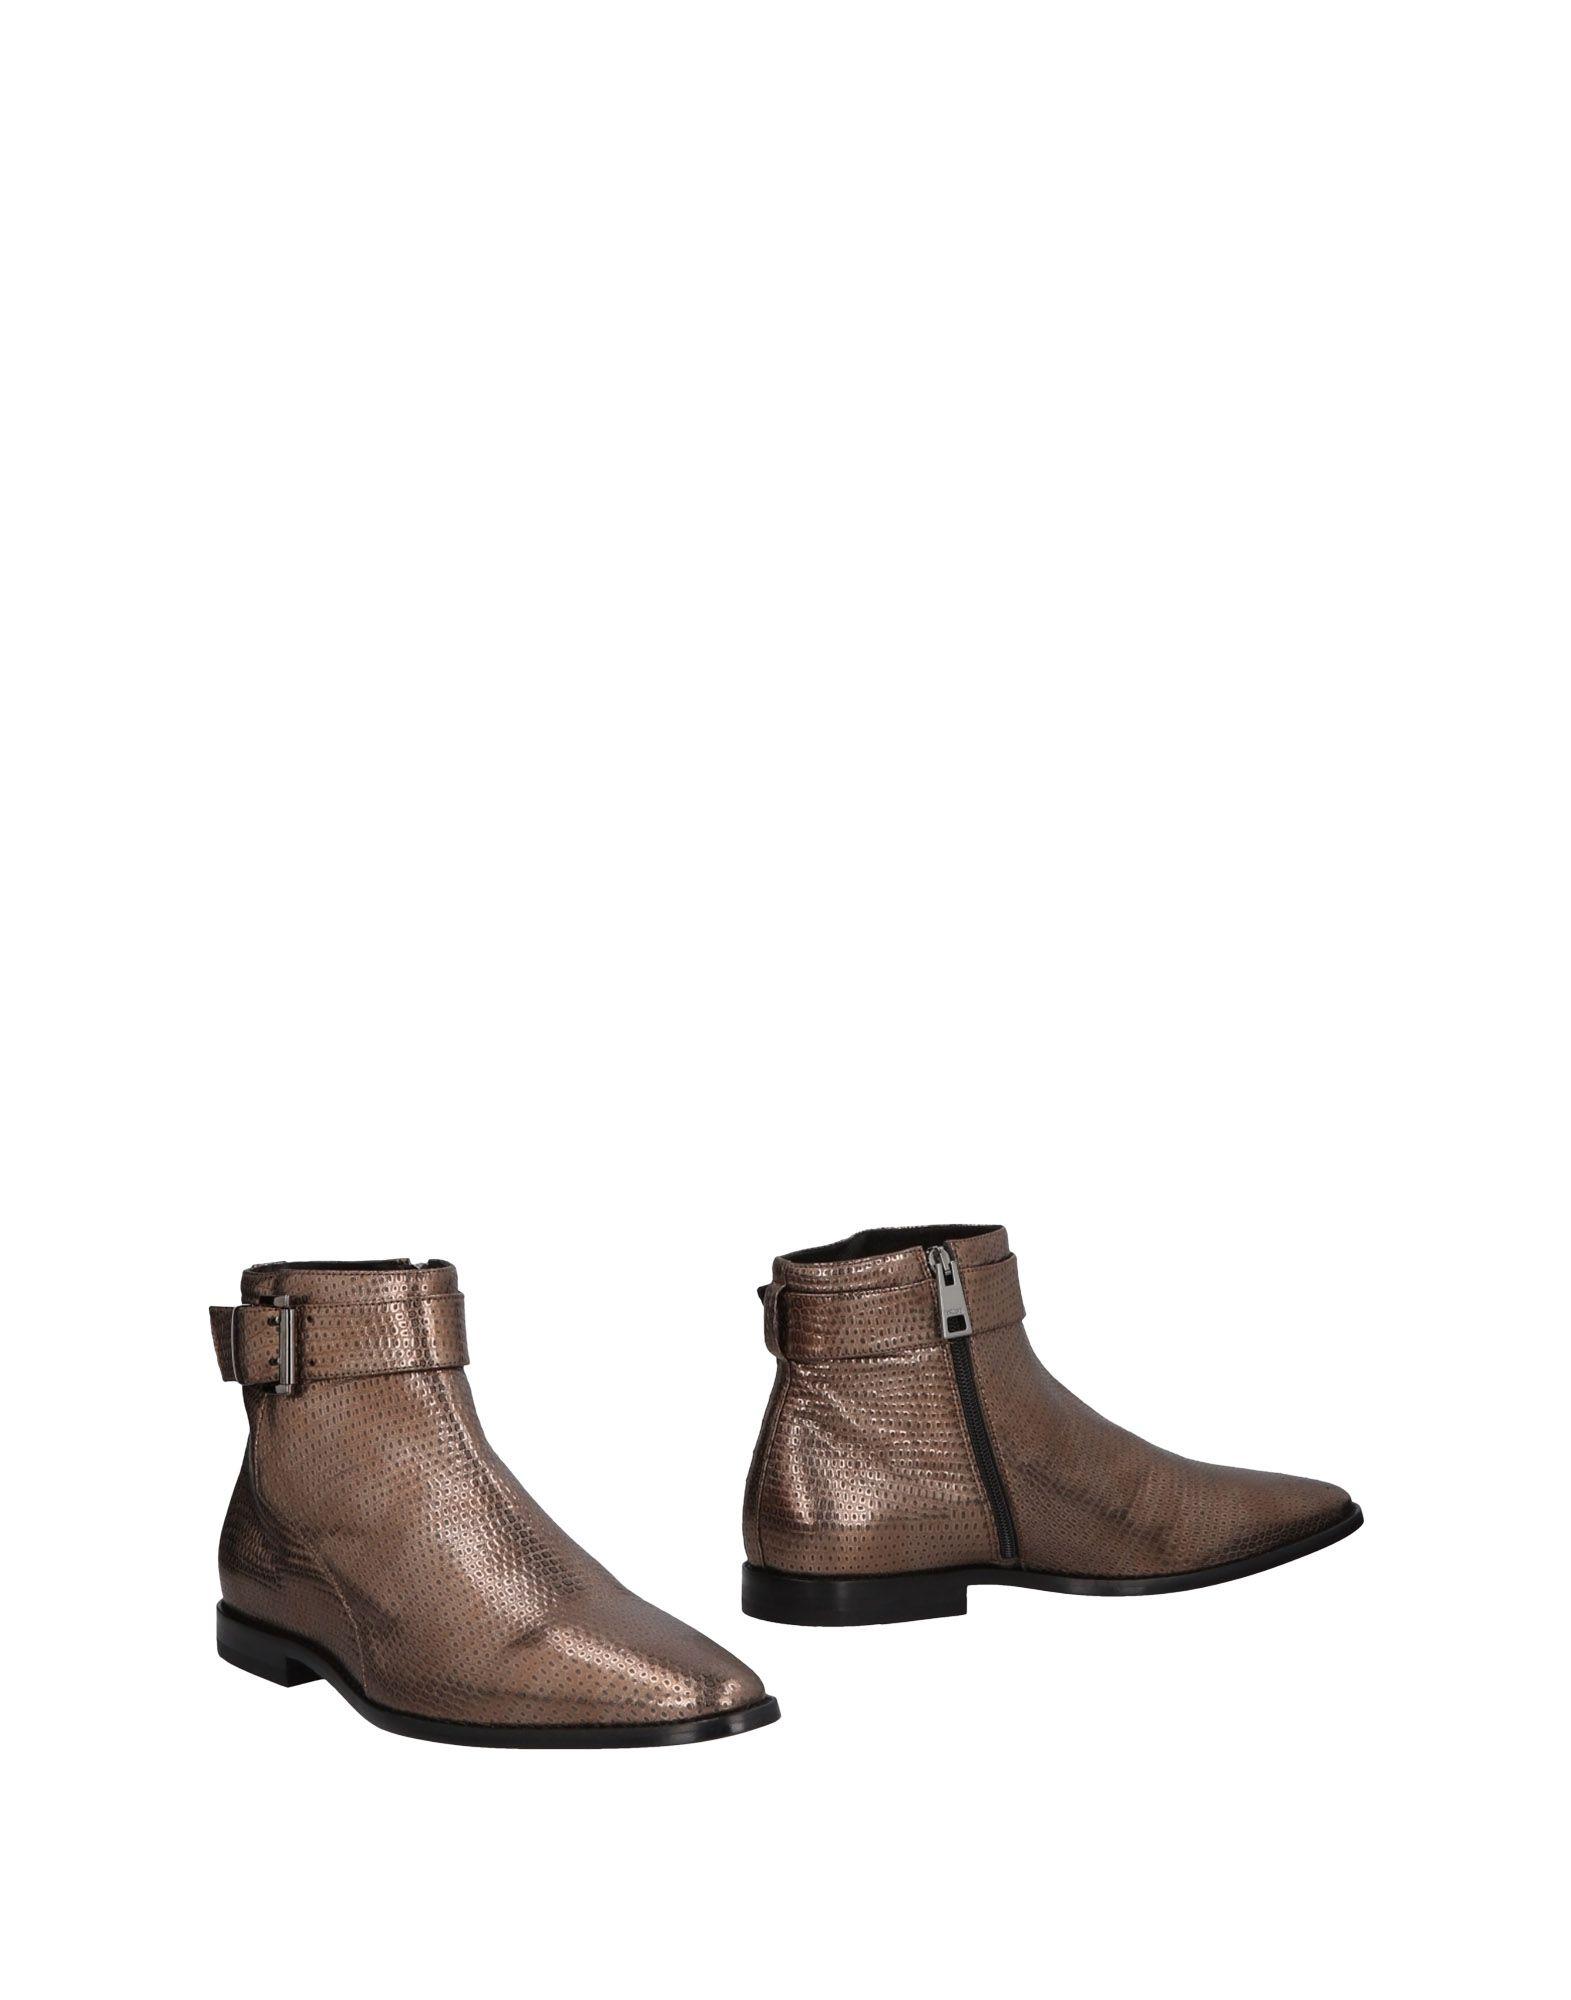 Just Cavalli Boots - Men Just Just Just Cavalli Boots online on  Australia - 11469976IO 8a1af3